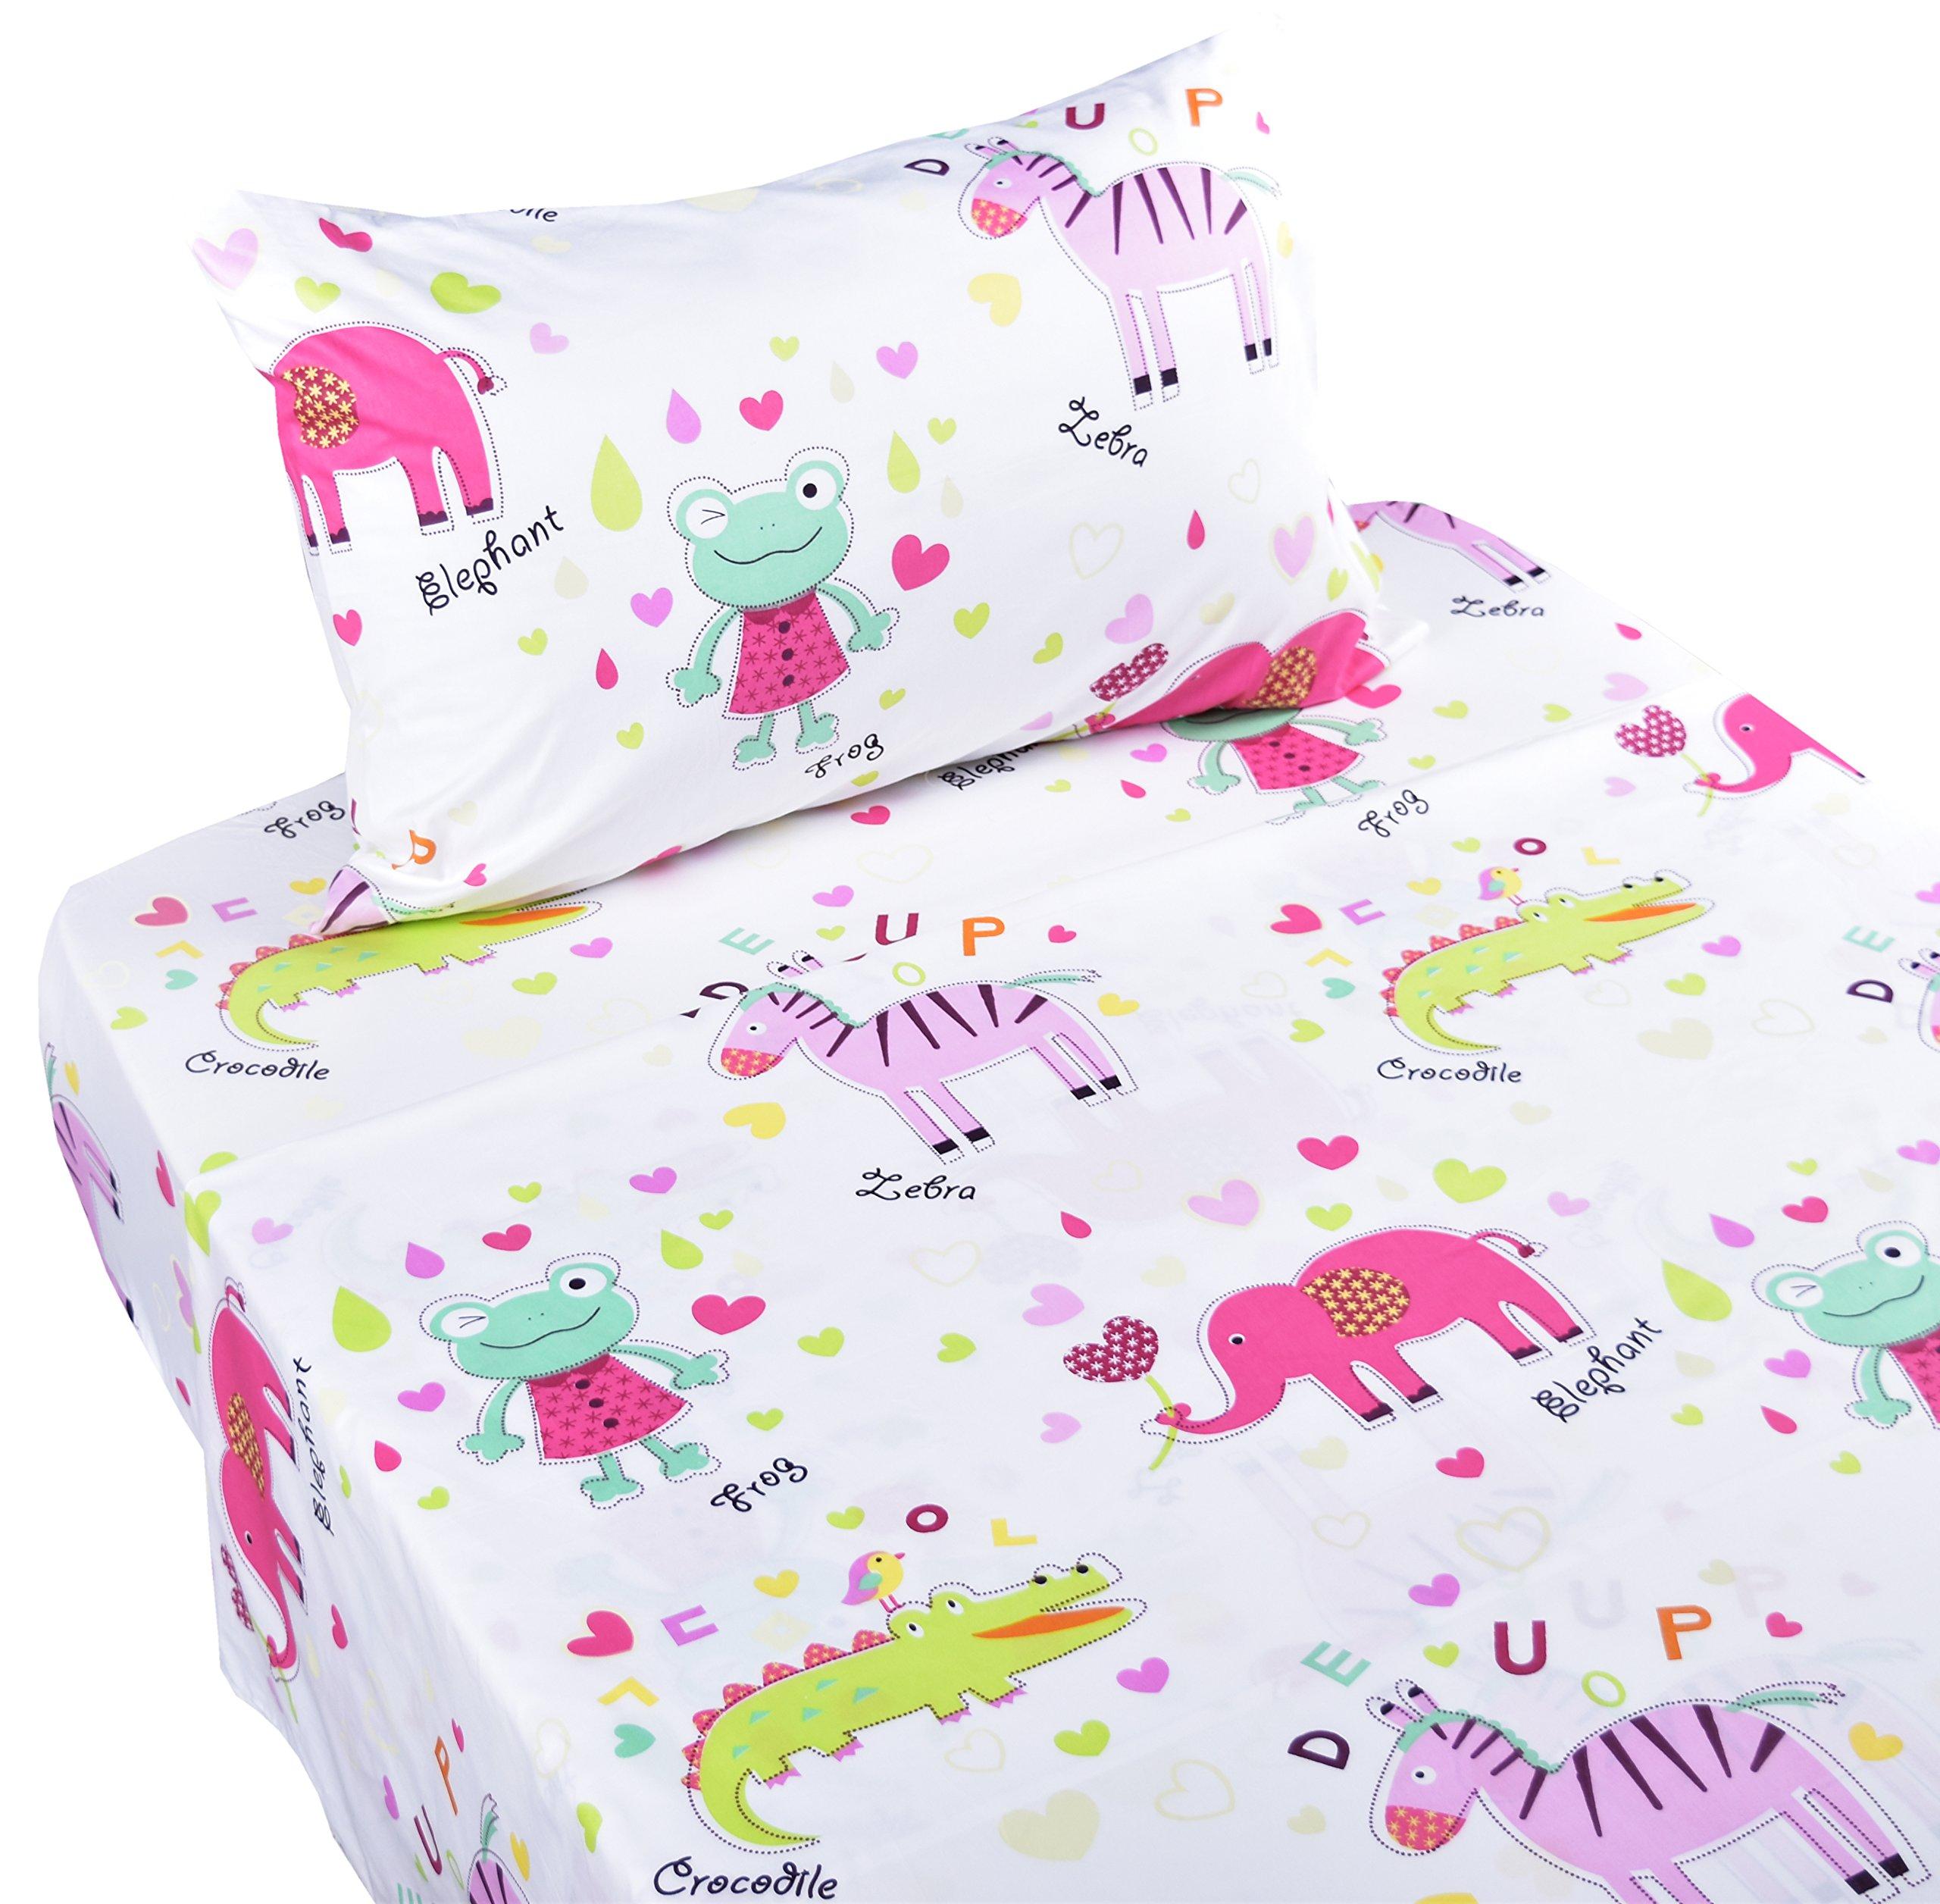 J-pinno Animals Frog Zebra Crocodile Elephant Twin Sheet Set for Kids Girl Children,100% Cotton, Flat Sheet + Fitted Sheet + Pillowcase Bedding Set